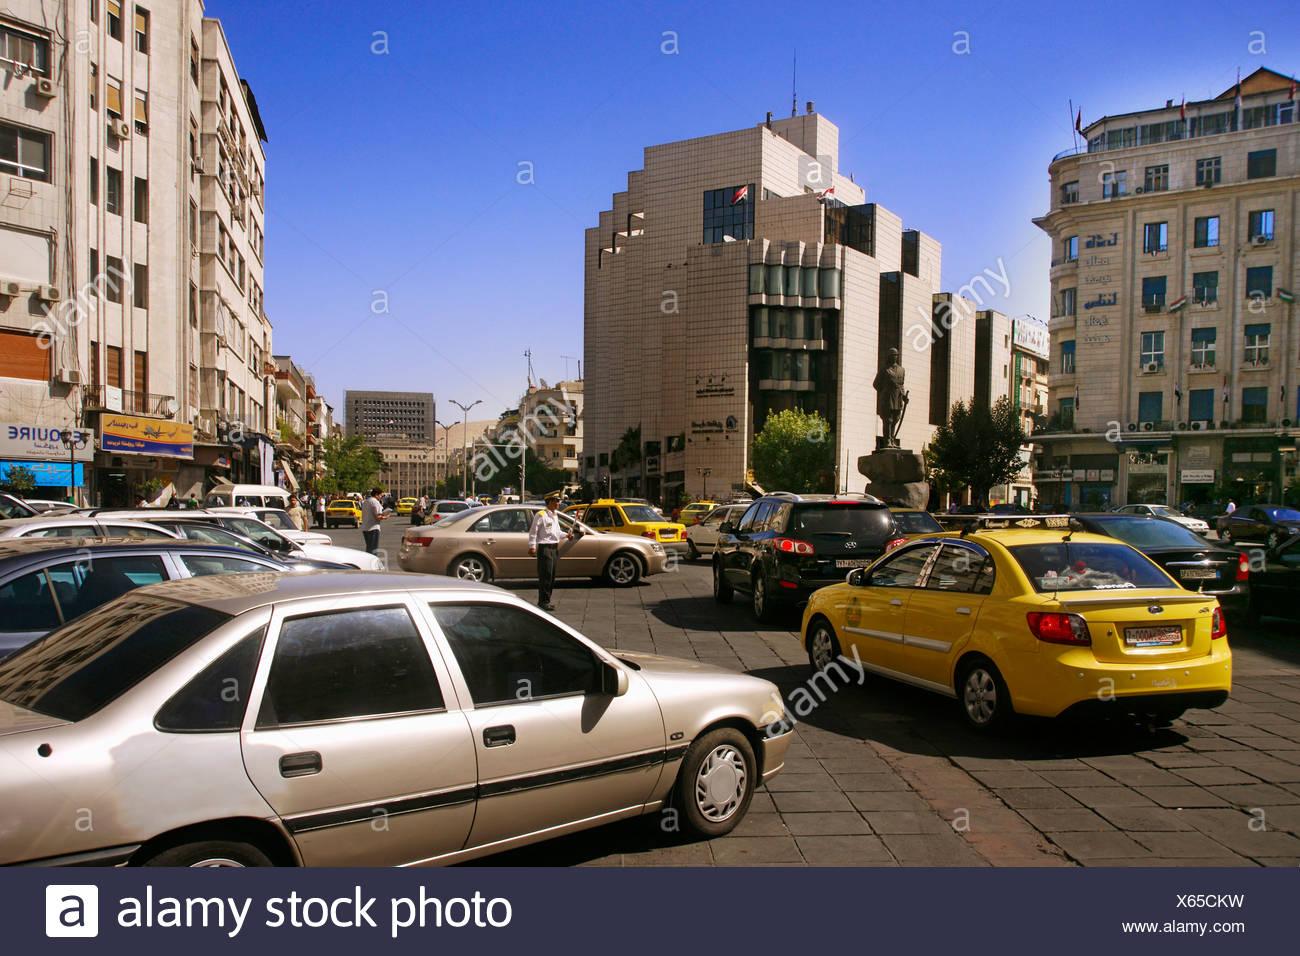 Yusuf al-Azma Square in the fashionable area of Salihiyé, Damascus, Syria - Stock Image